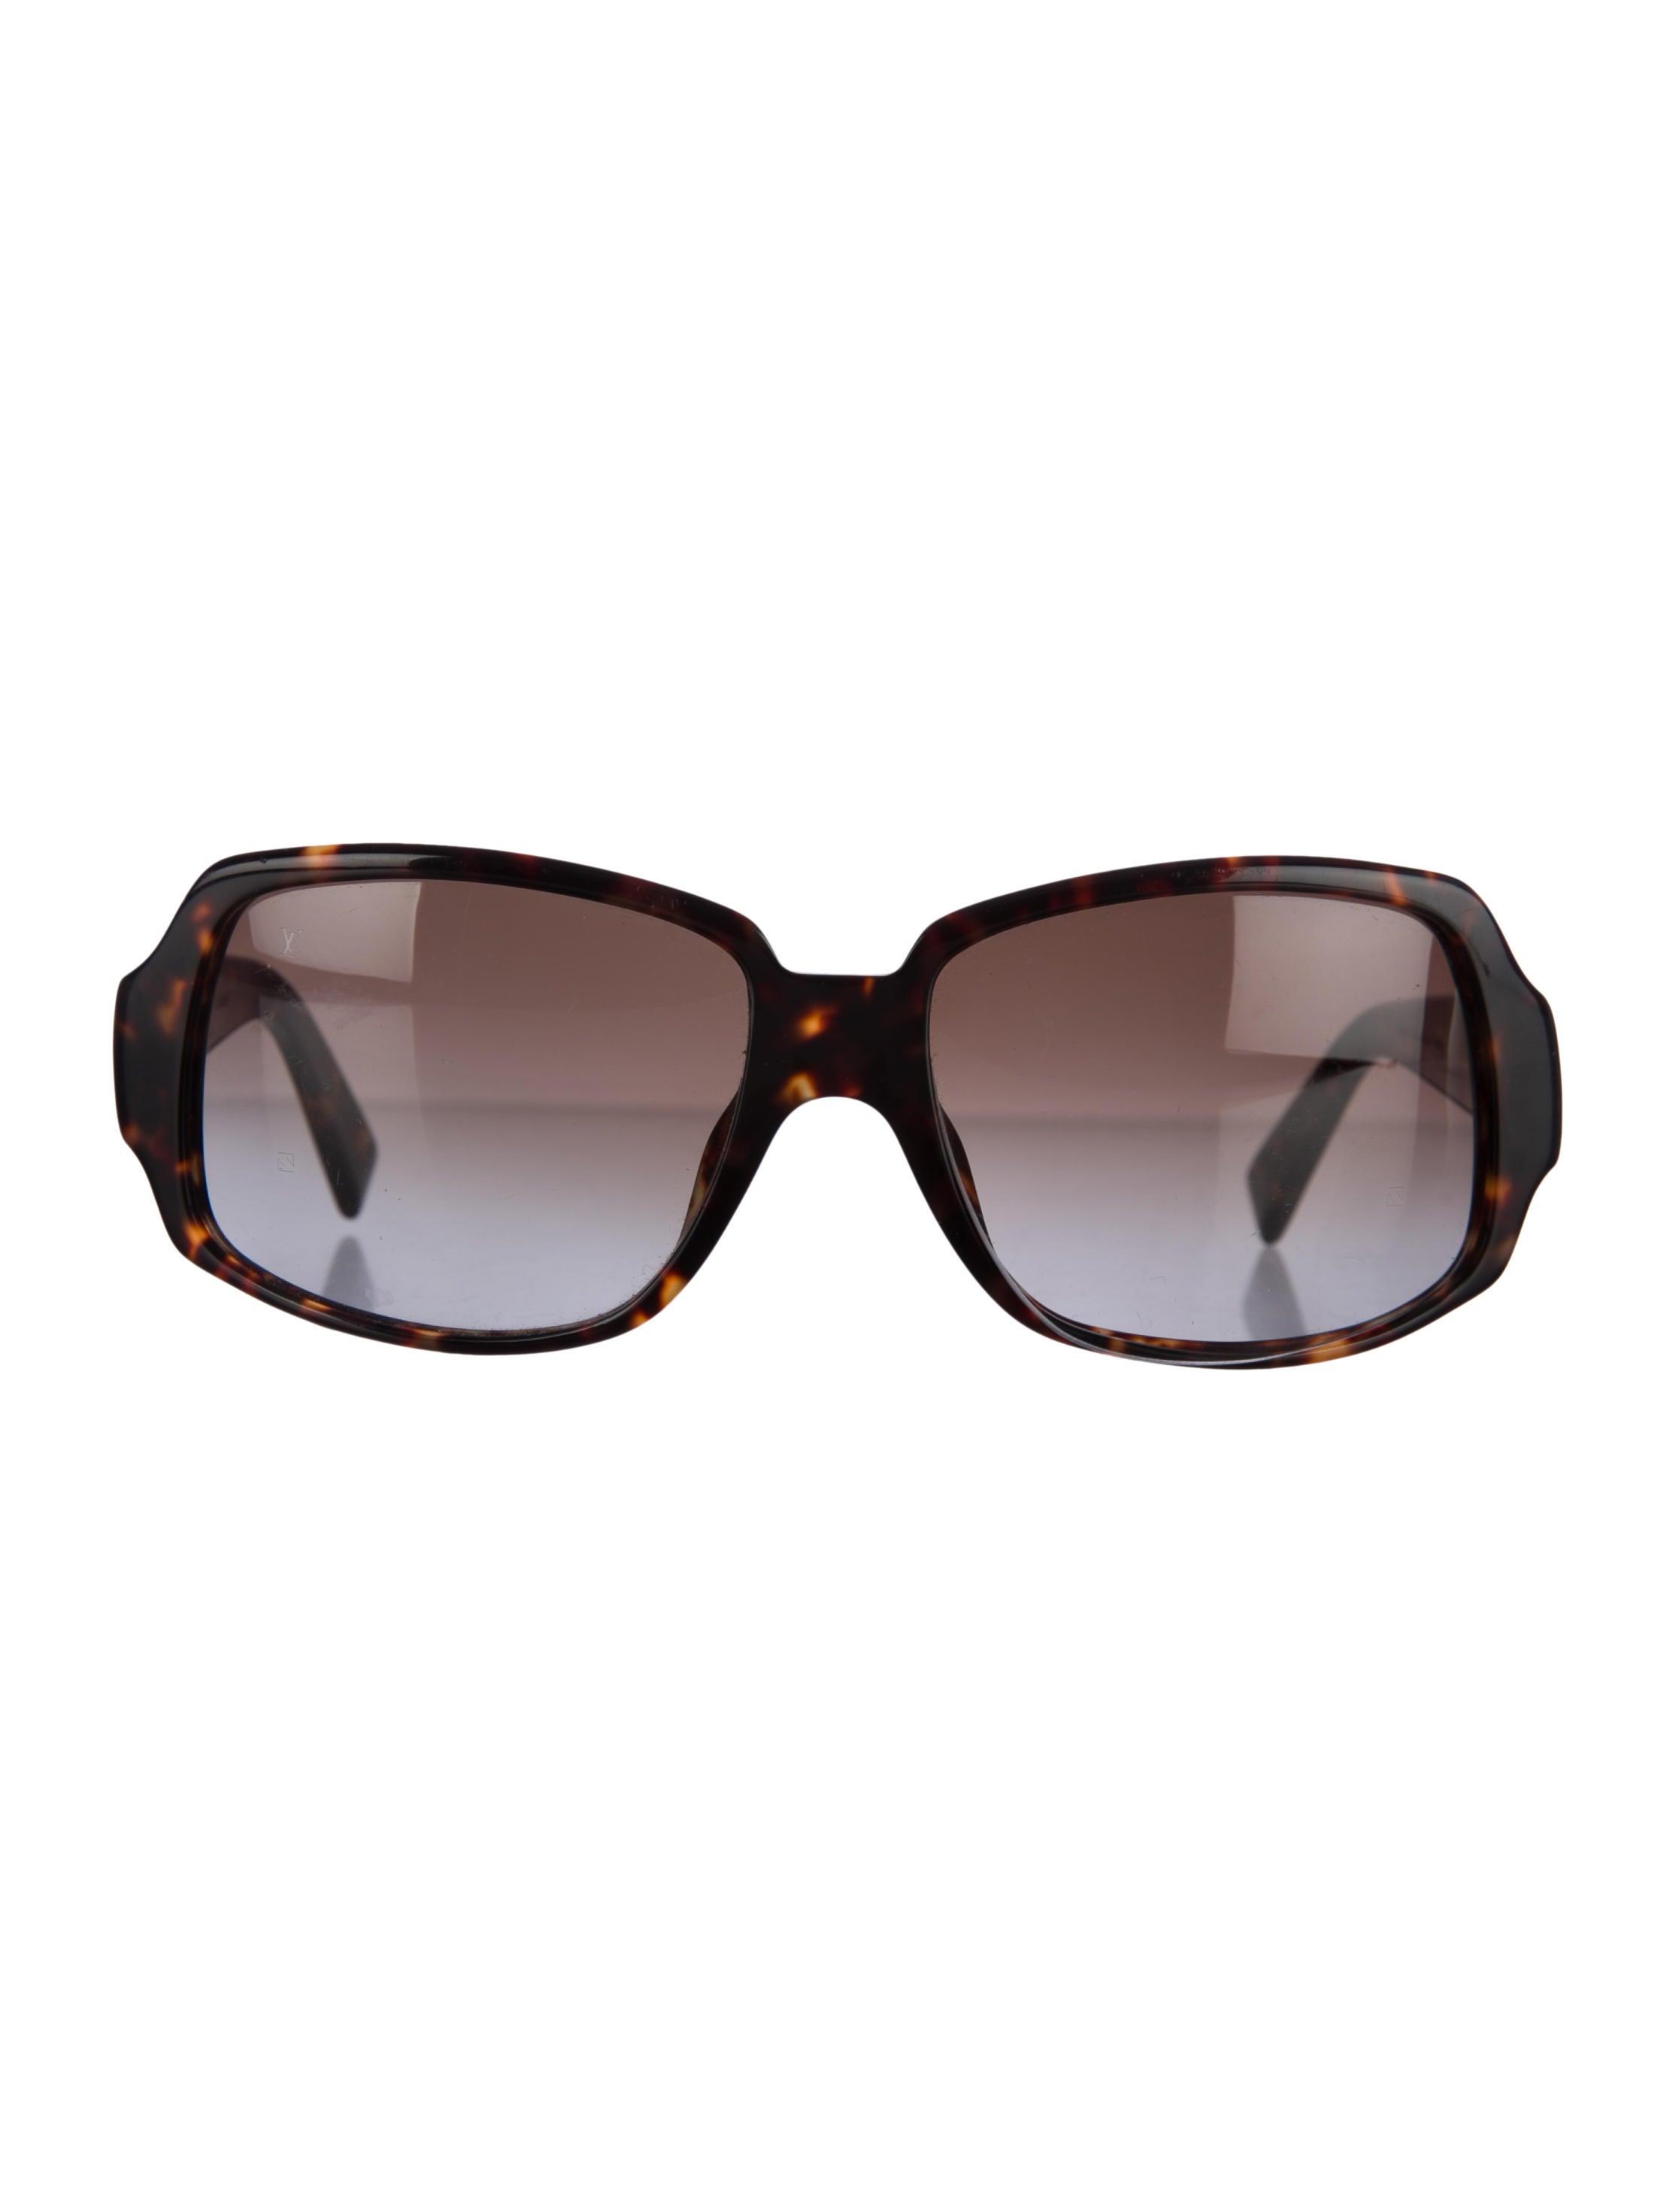 3d166a5185984 Louis Vuitton Obsession GM Sunglasses - Accessories - LOU53488